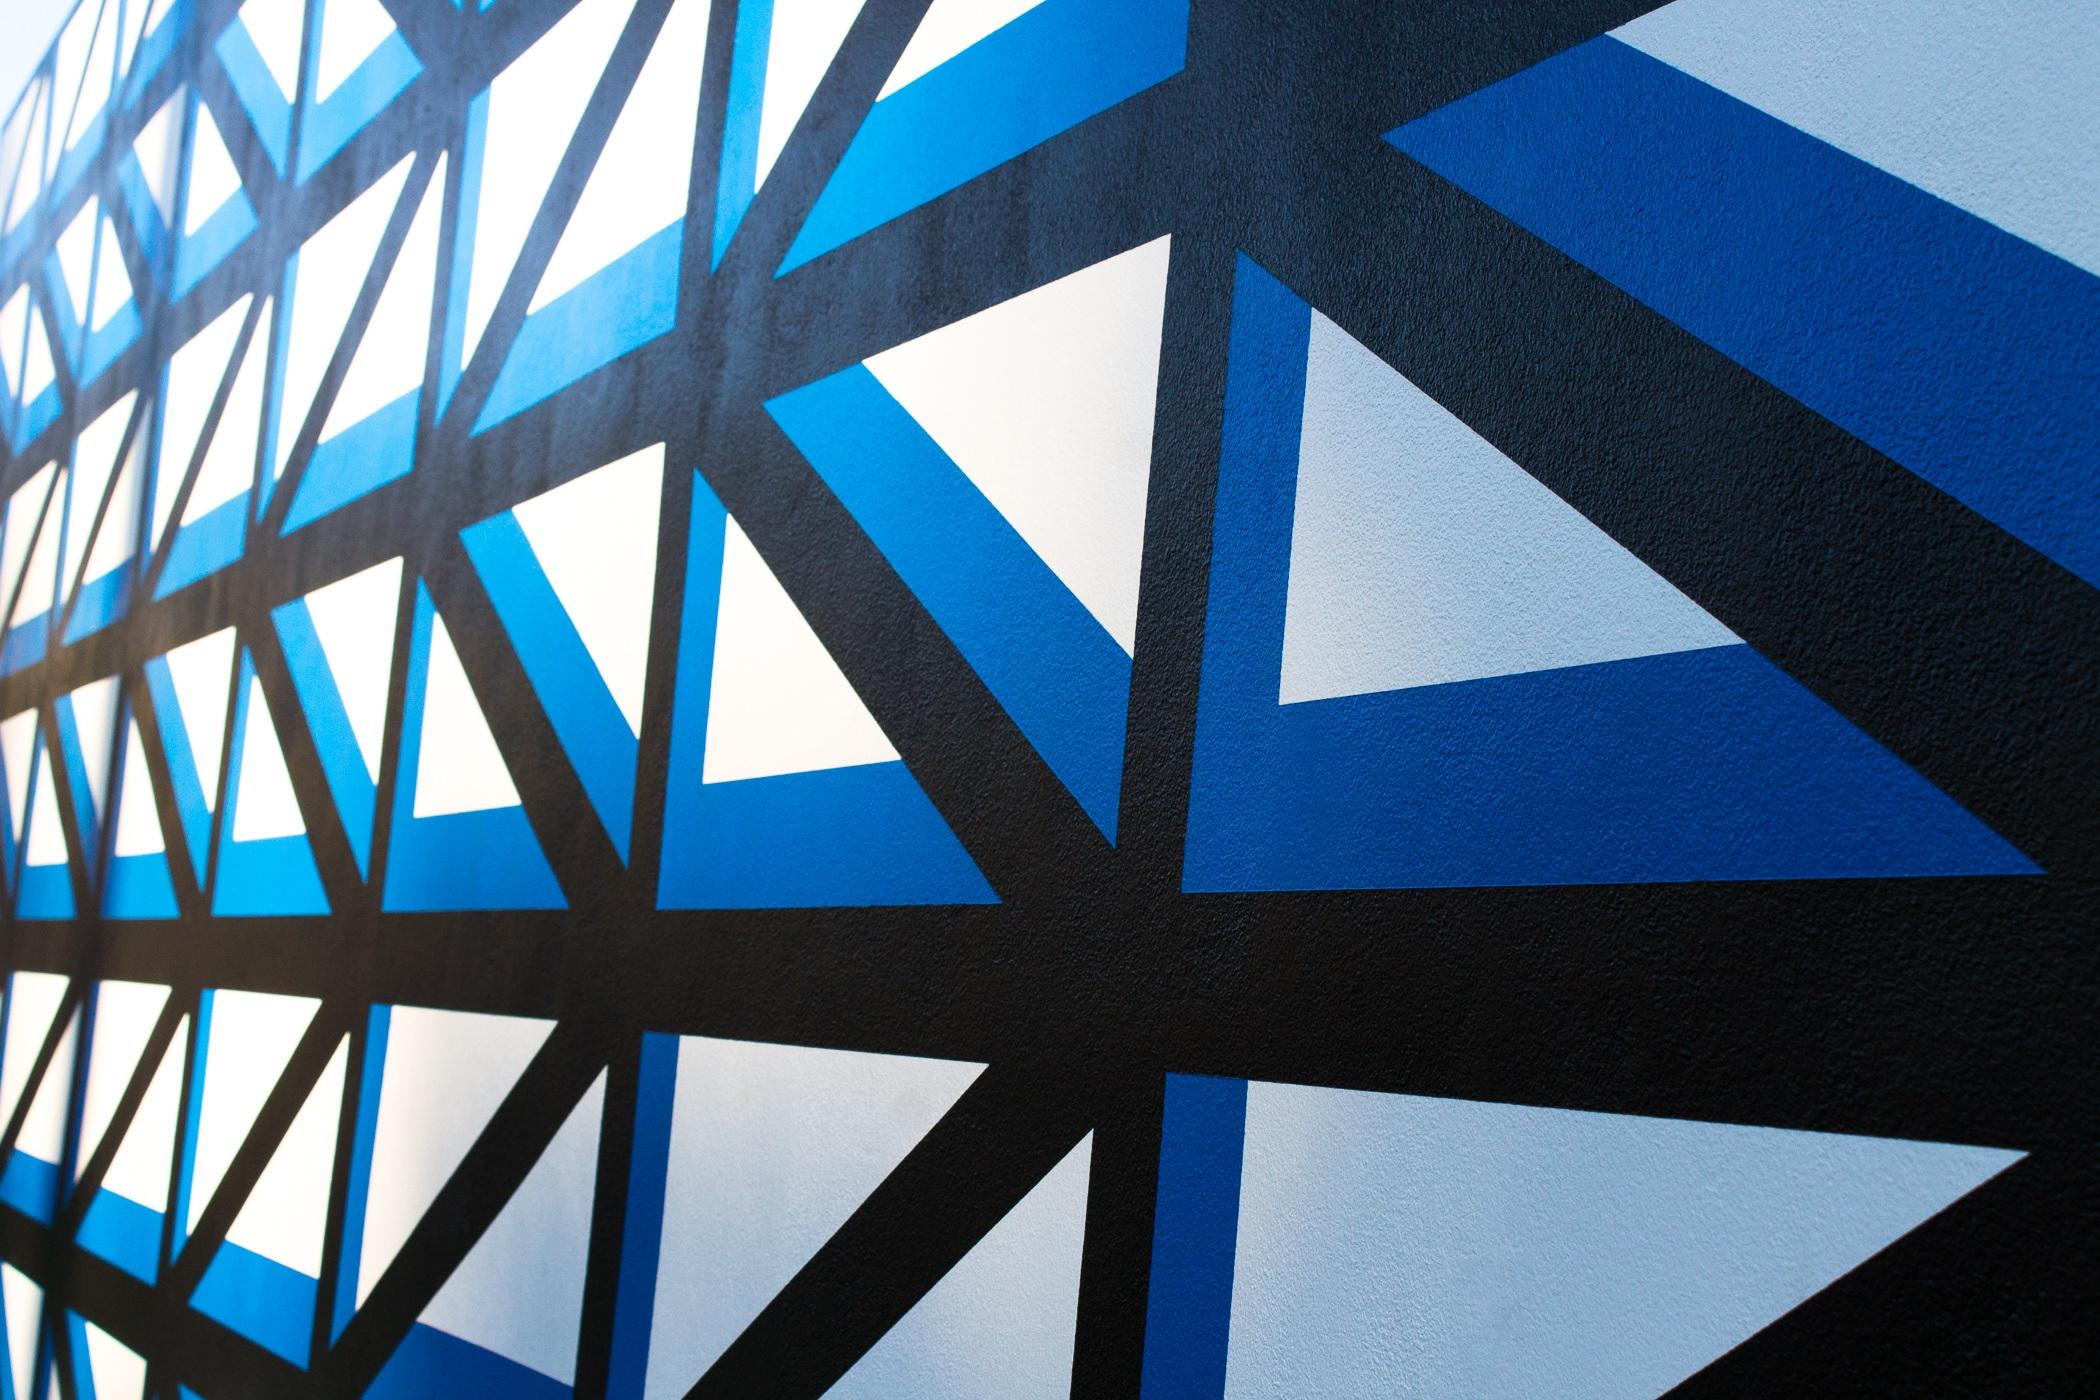 Gambar Garis Warna Biru Lingkaran Seni Baris Latar Belakang Desain